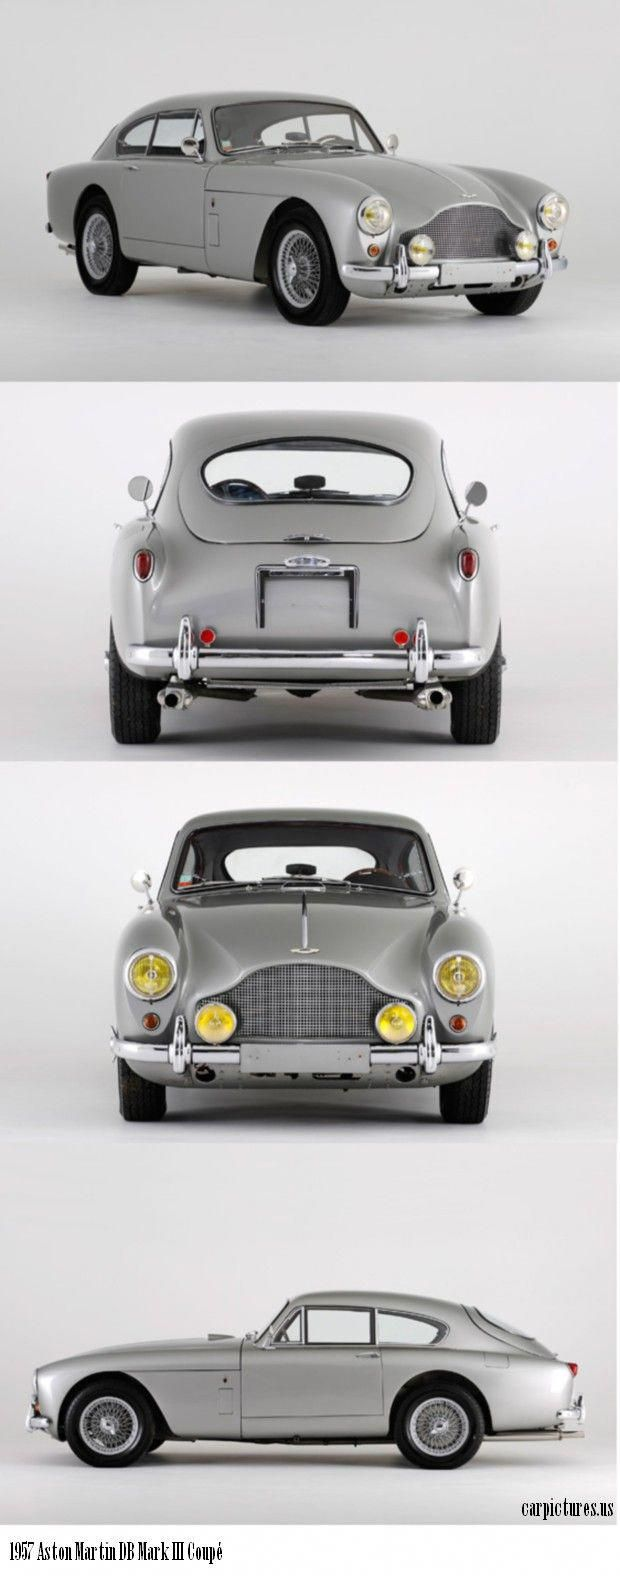 1957 Aston Martin Db Mark Iii Coupé Astonmartinclassiccars Aston Martin Aston Martin Cars Classic Cars